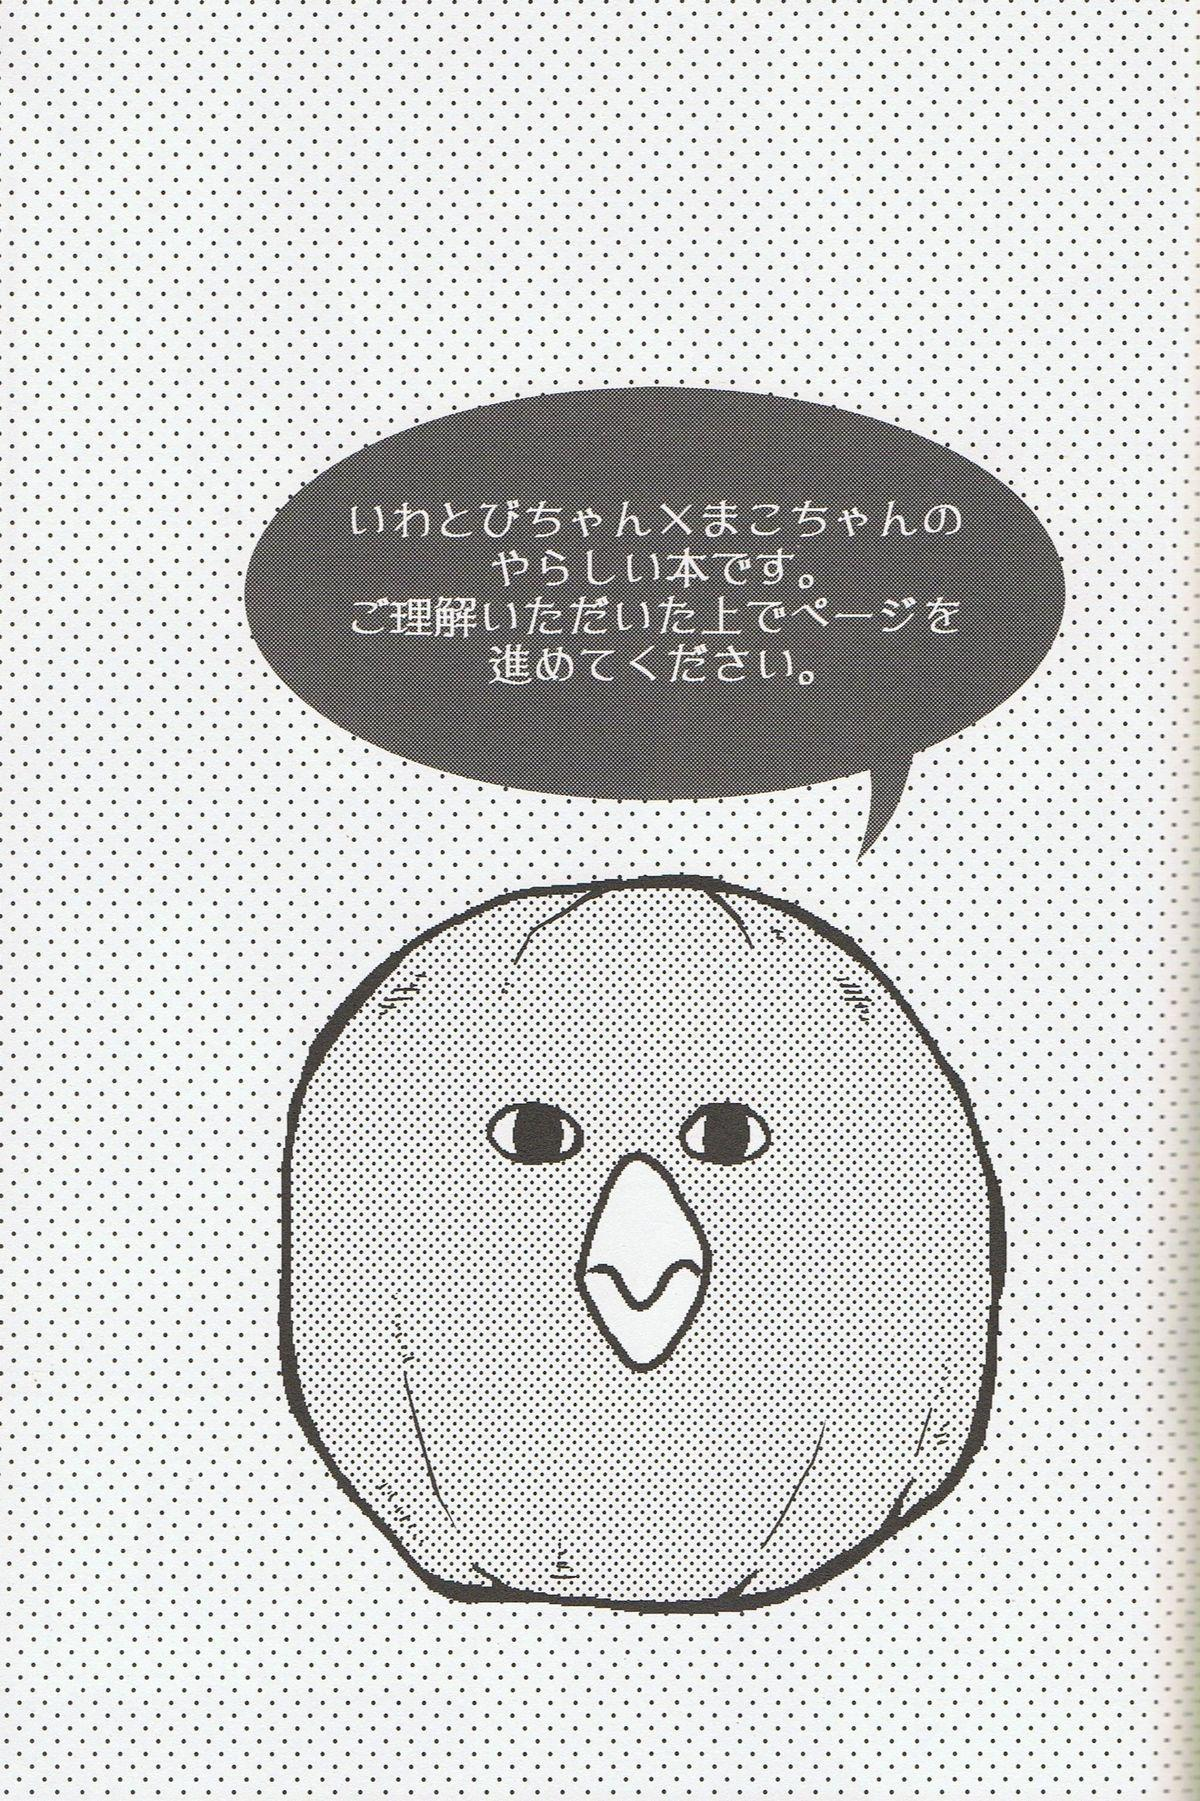 Furikaereba Iwatobi-chan 1